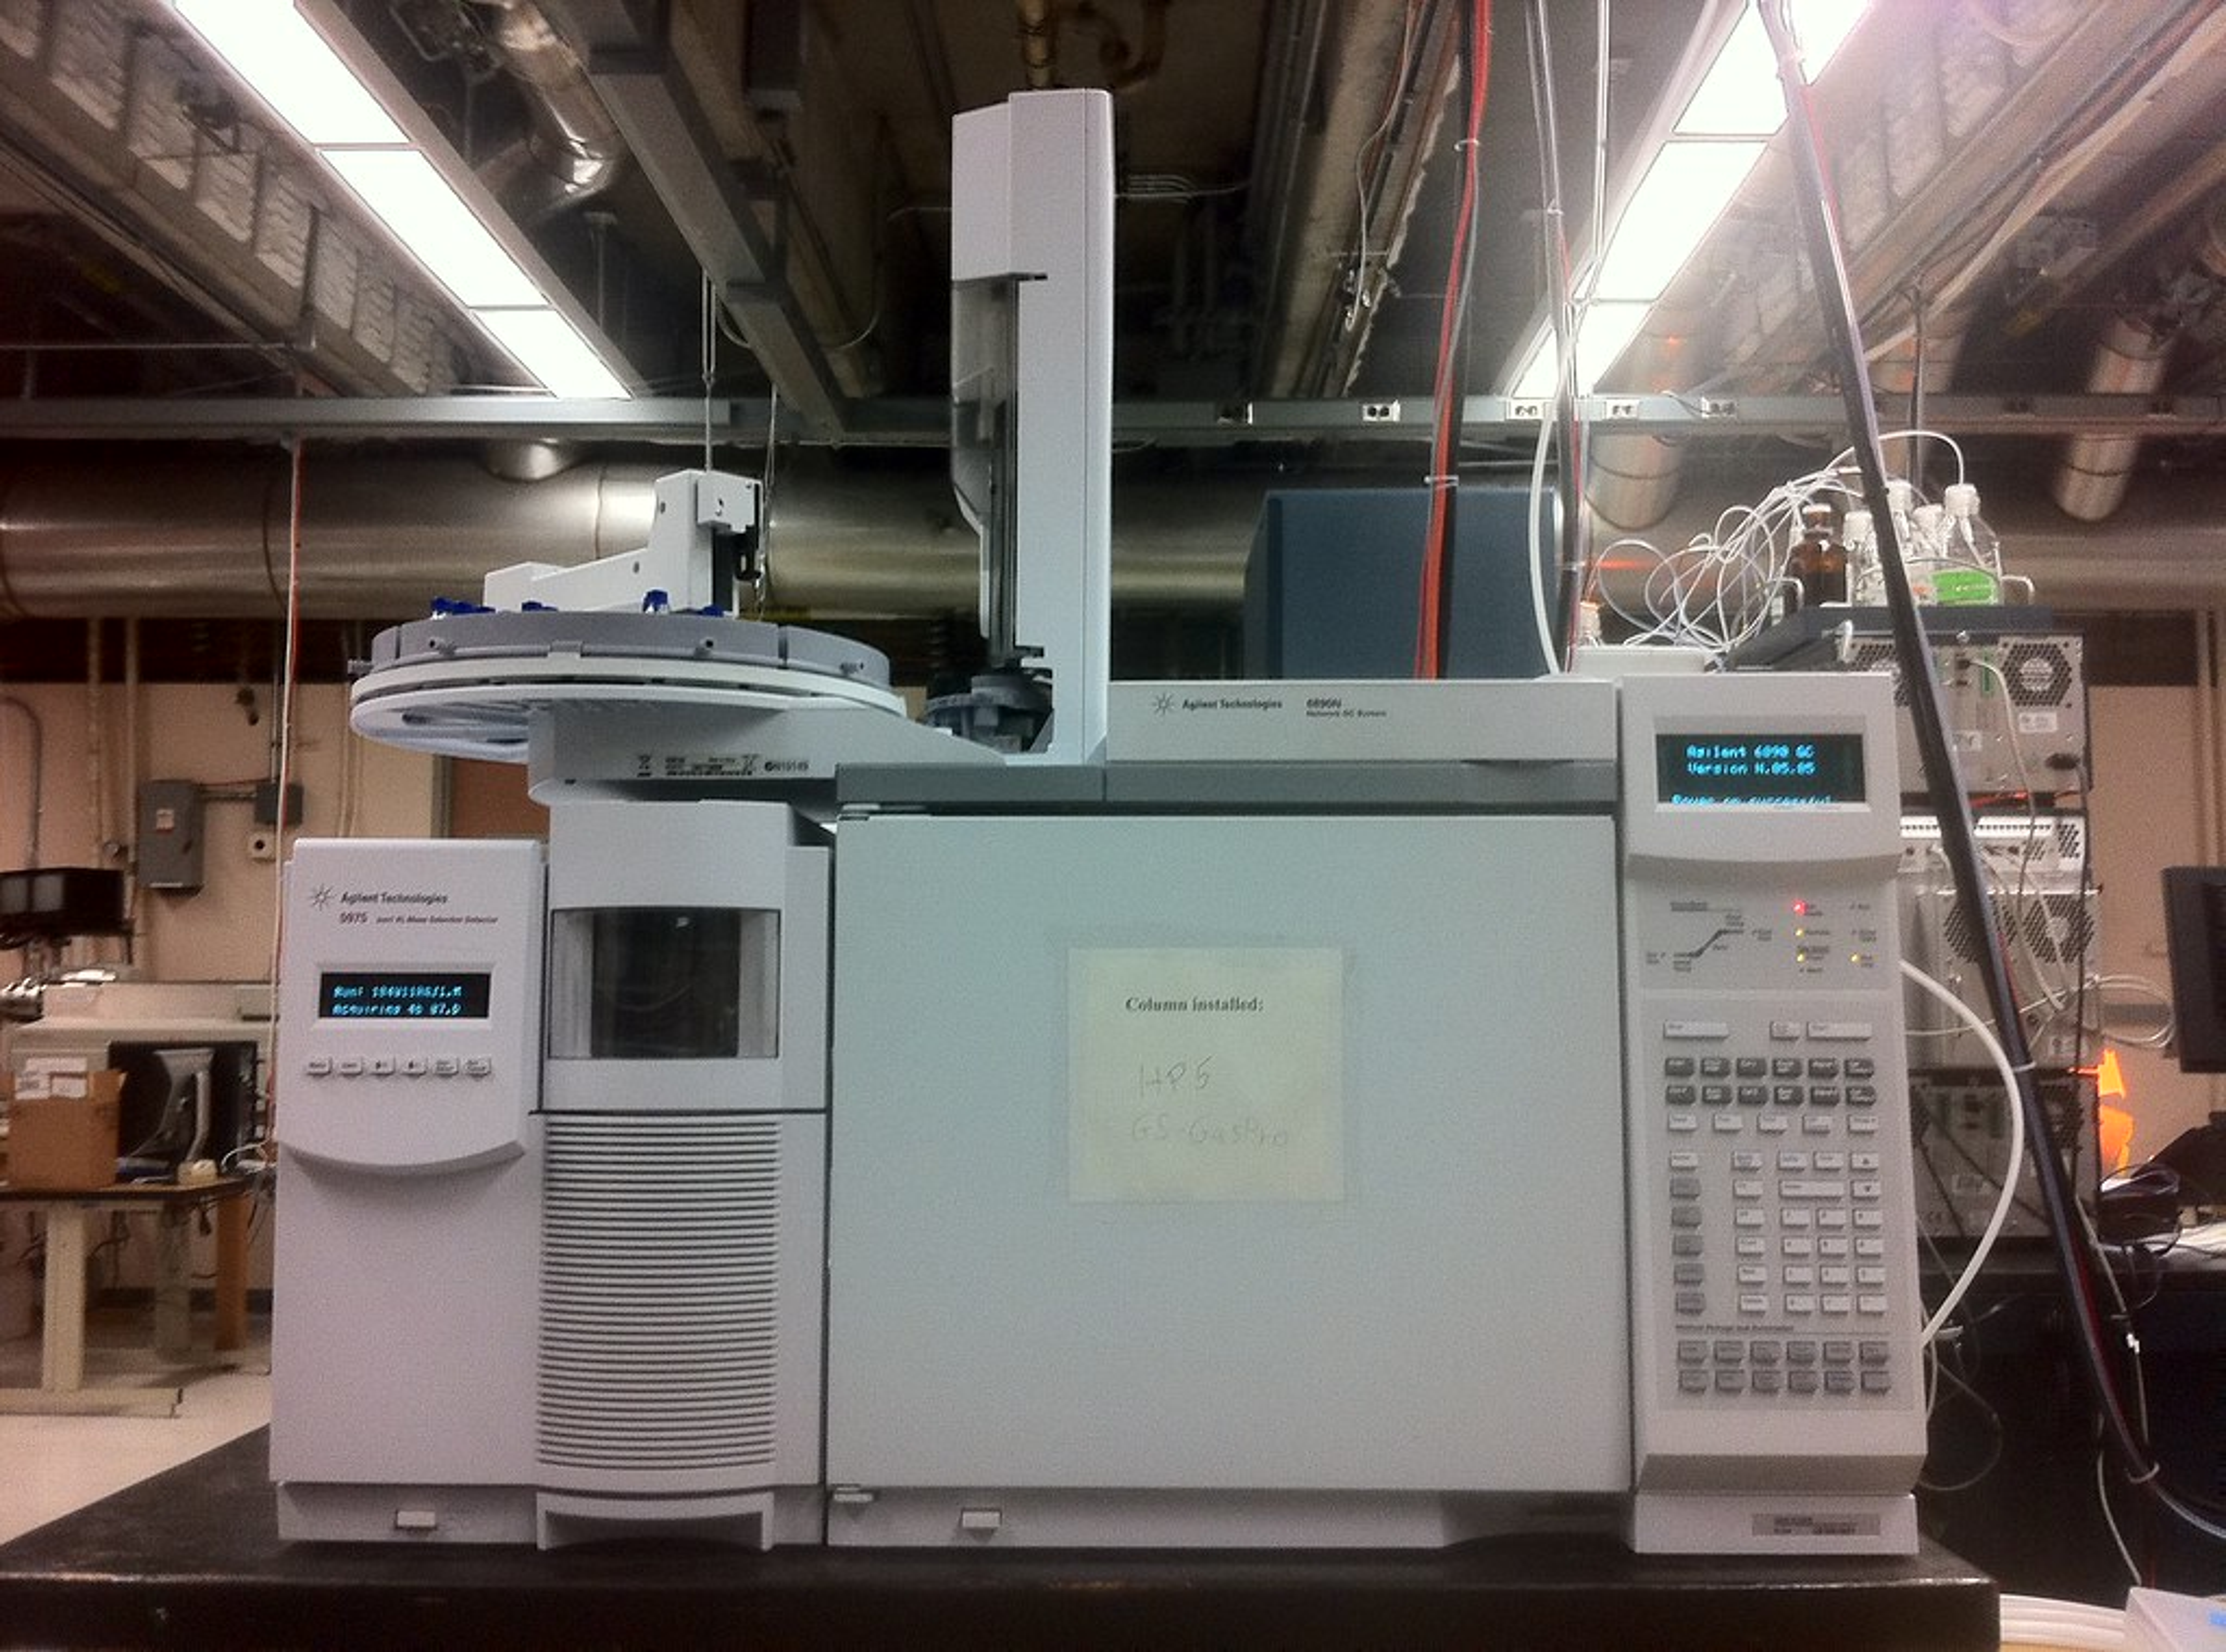 GCMS: Gas Chromatography/Mass Spectrometry